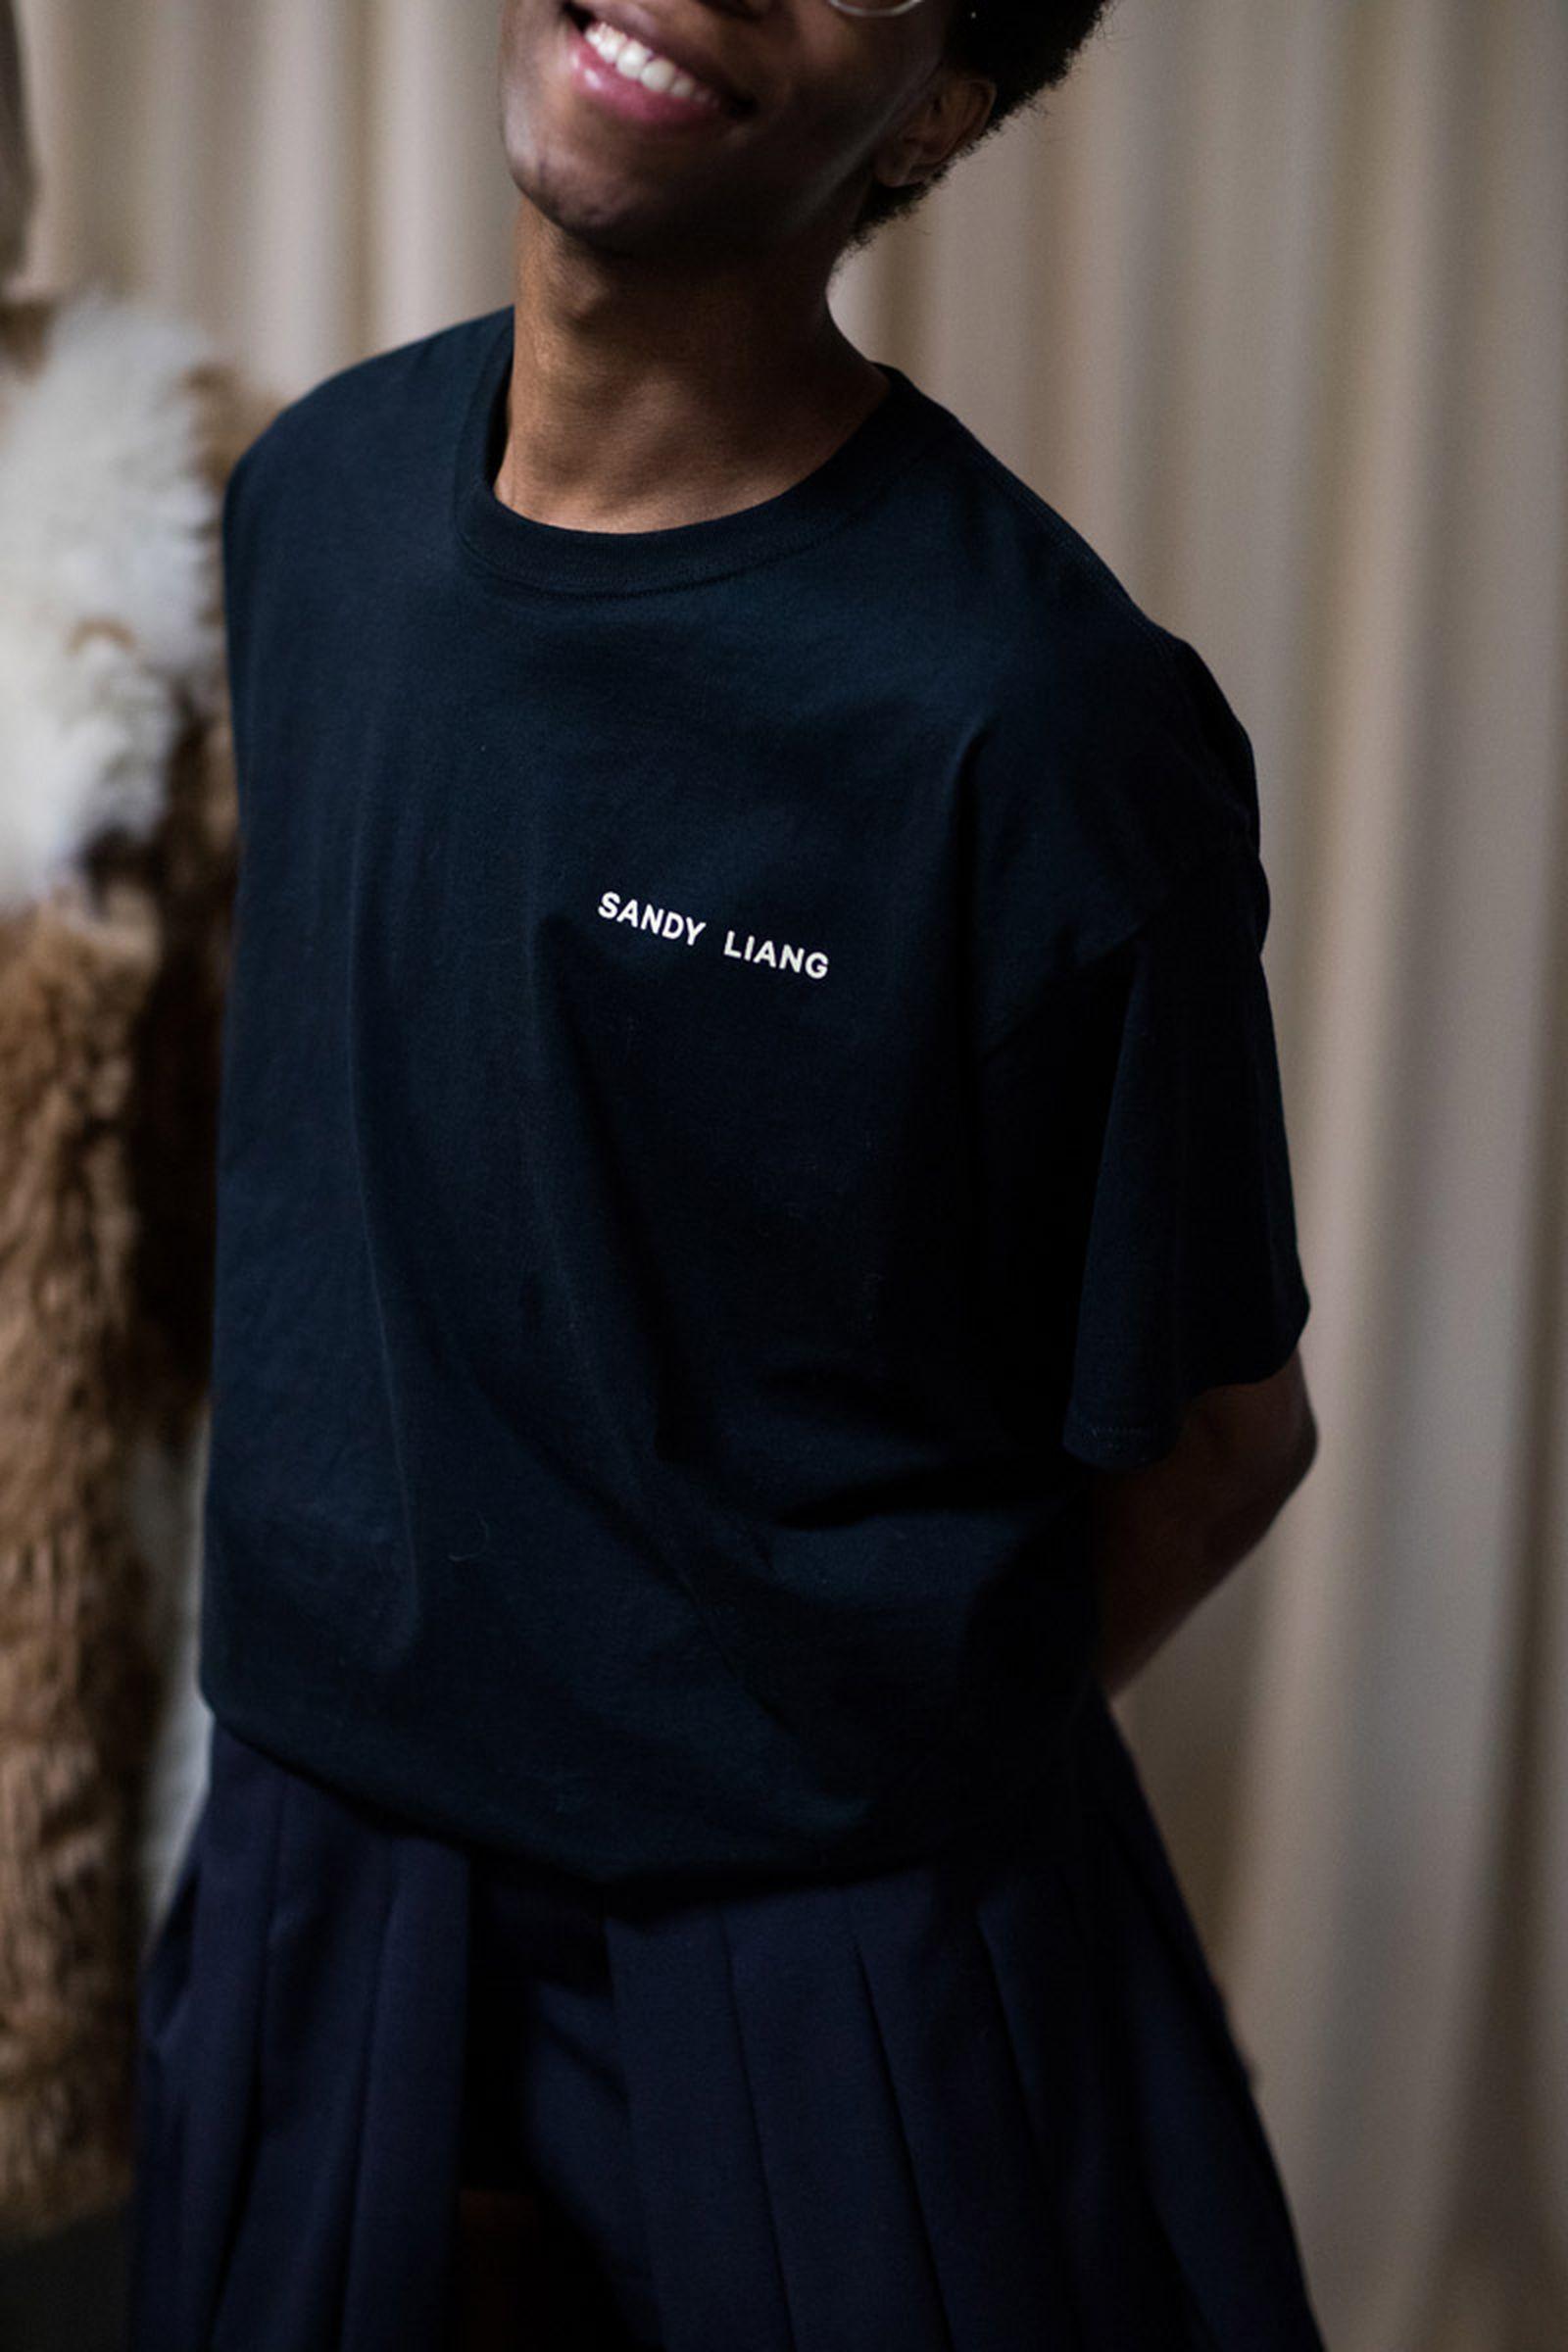 8sandy liang fw19 new york fasgion week Sadny Liang new york fashion week